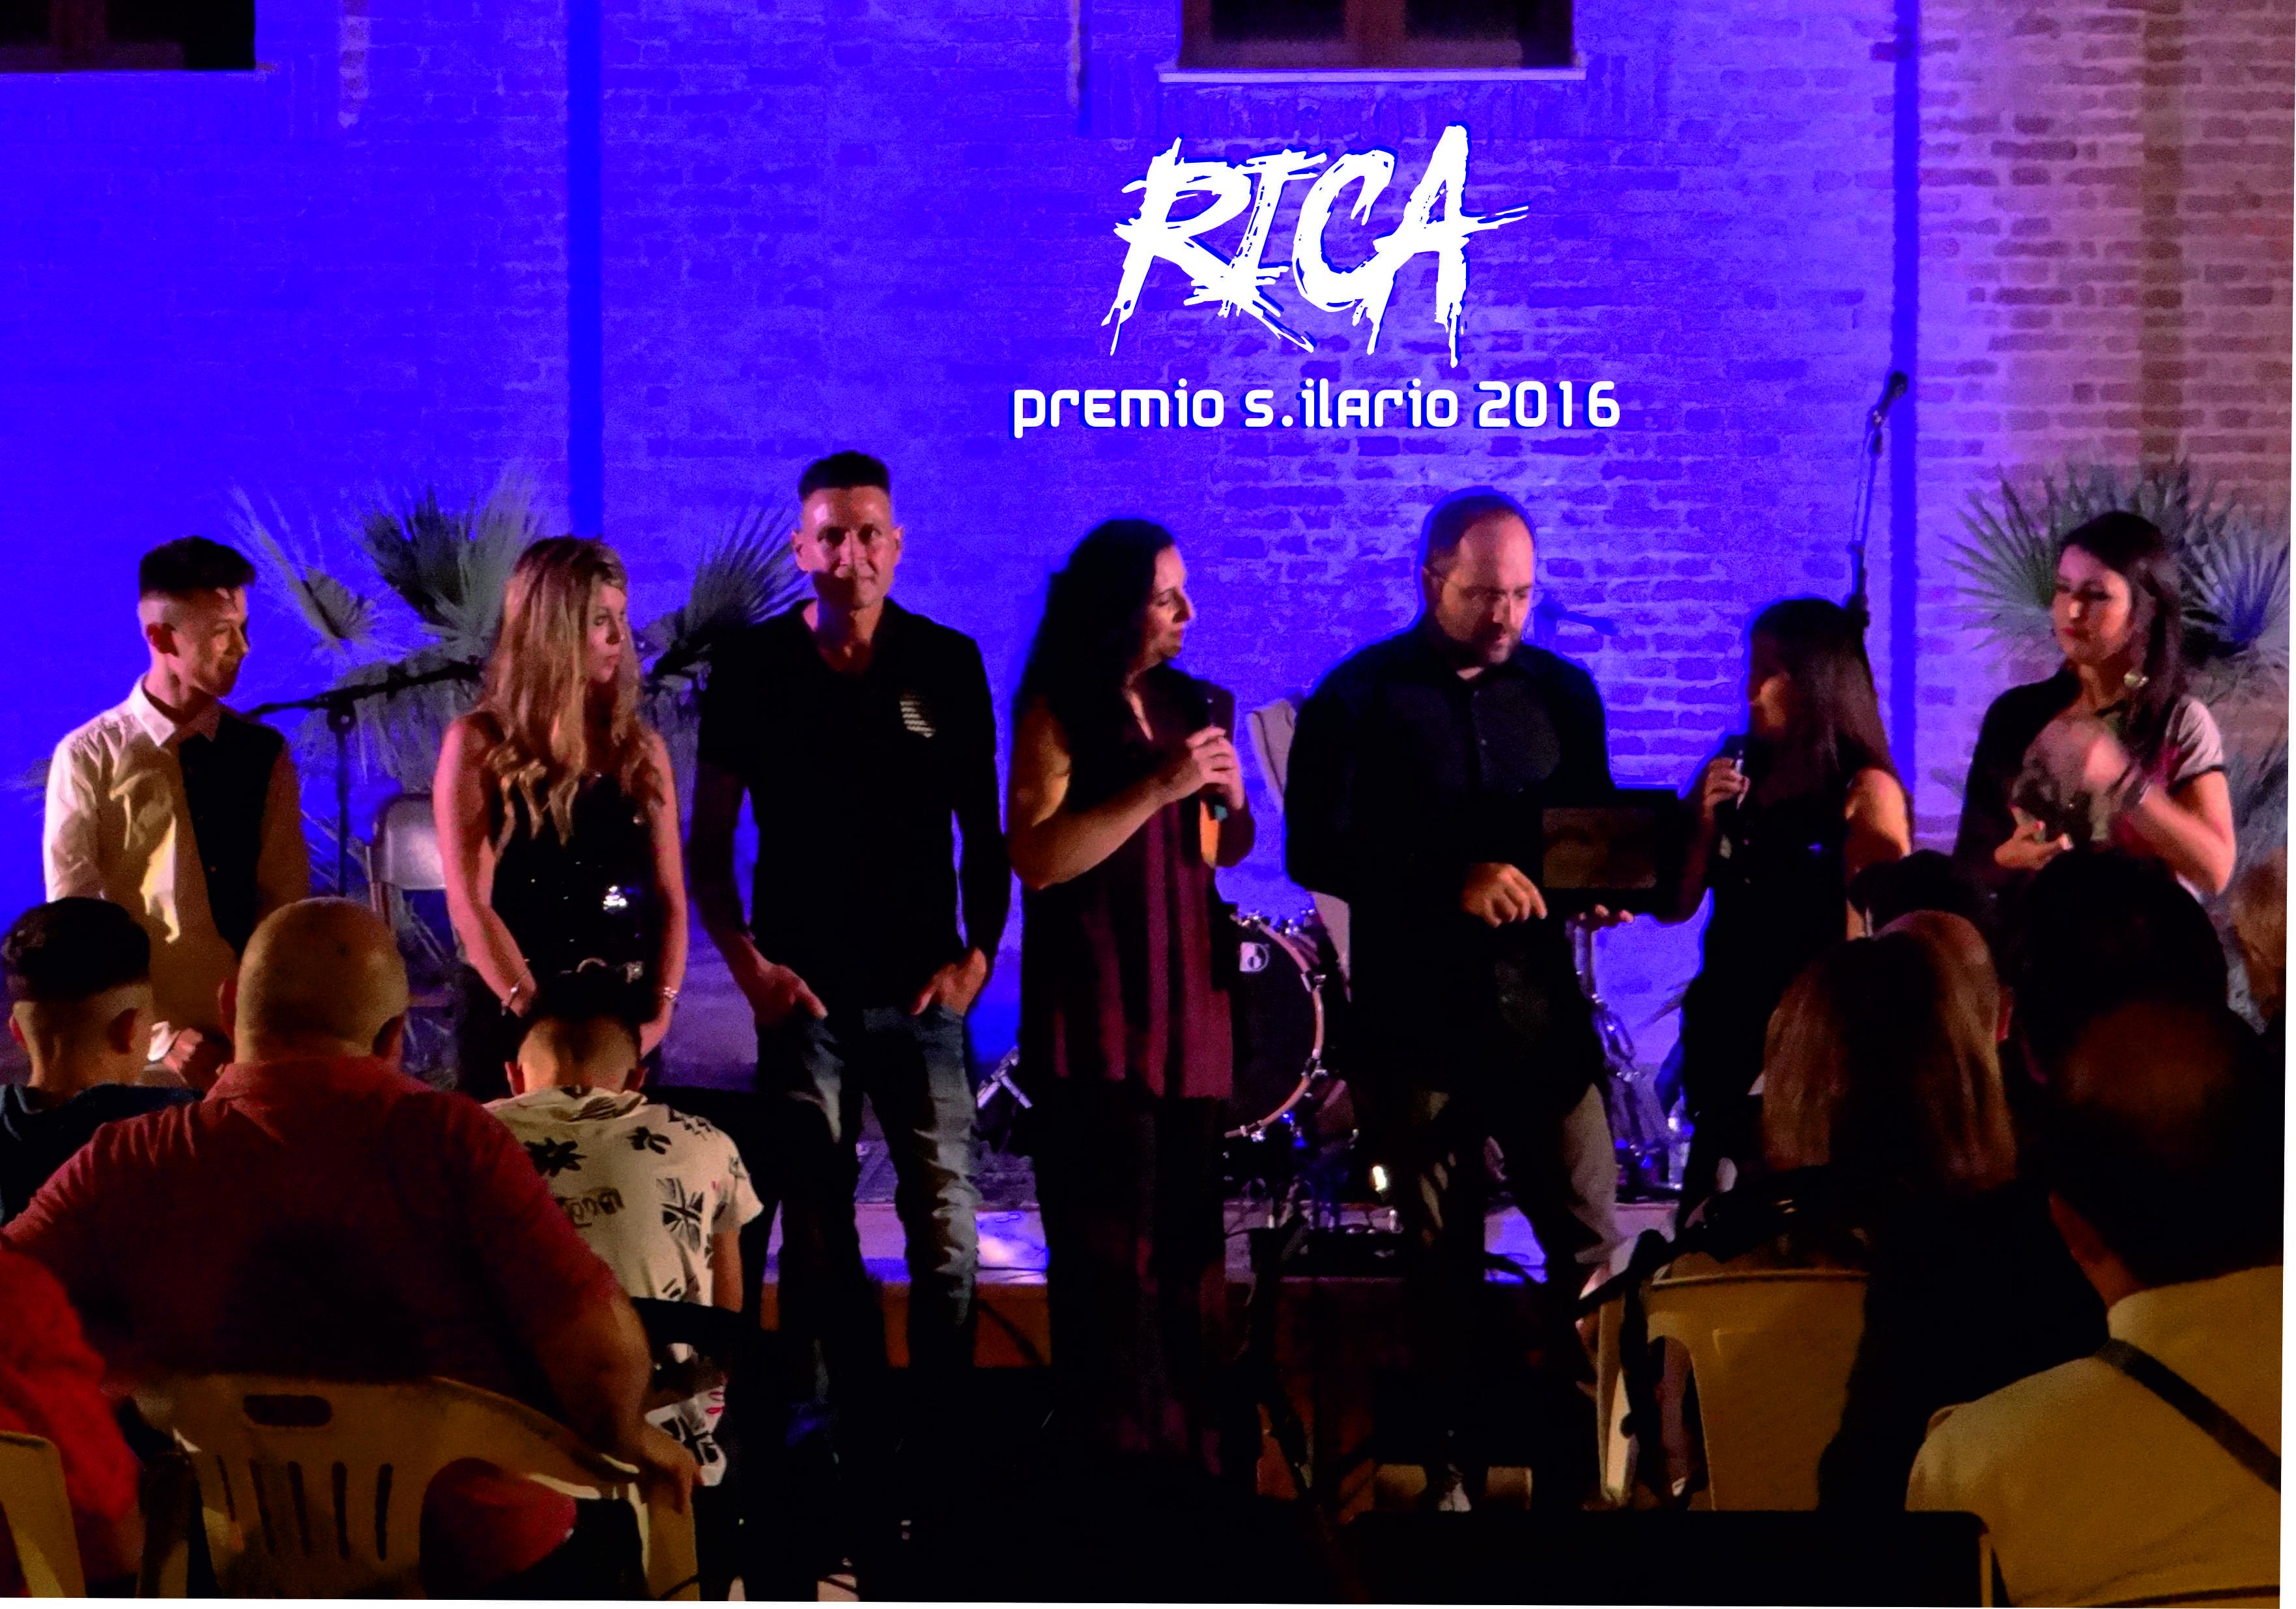 Rica premio S. Ilario 2016